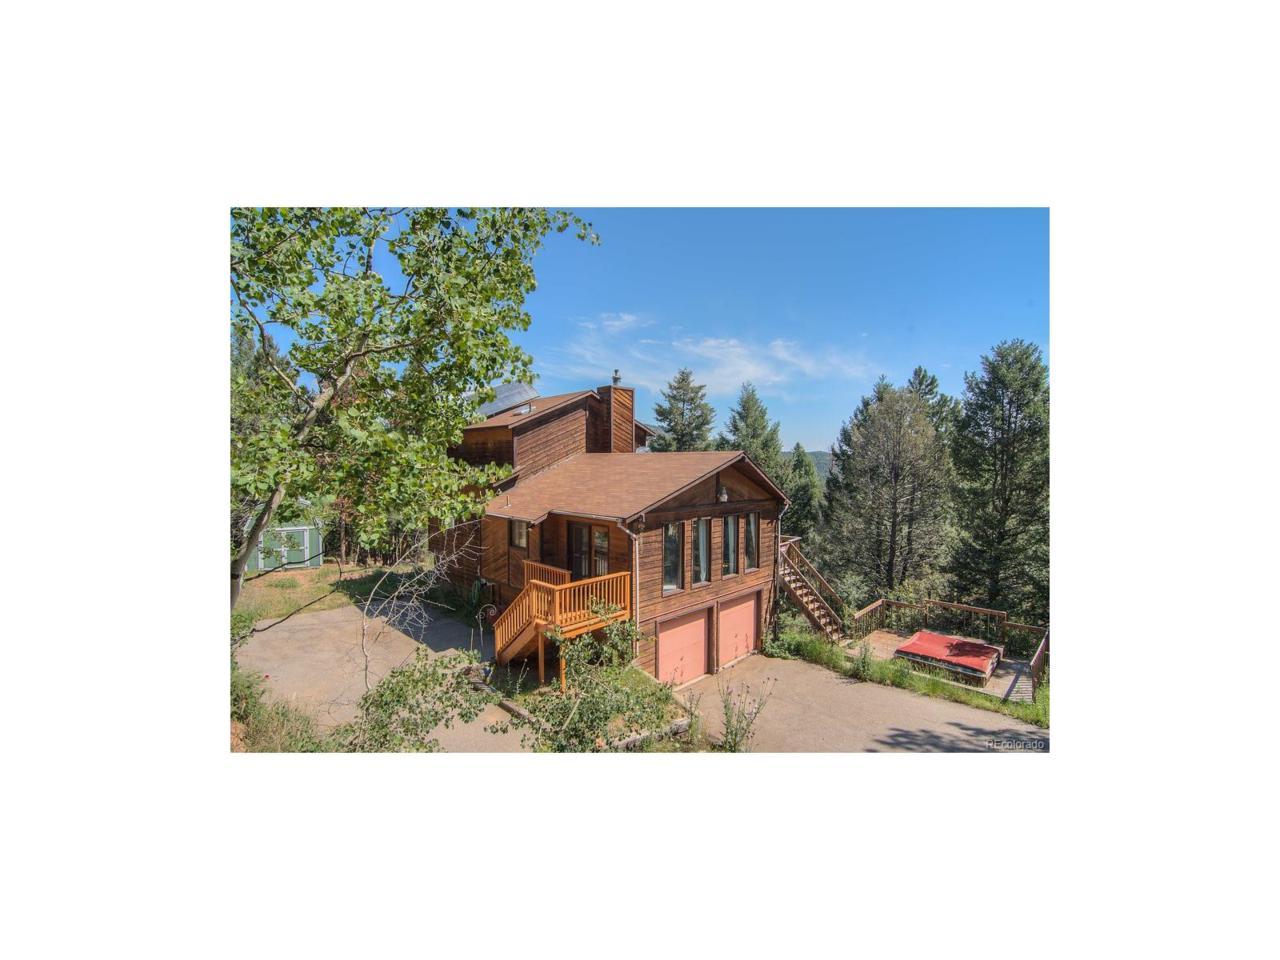 11764 Little Turtle Lane, Conifer, CO 80433 (MLS #6203047) :: 8z Real Estate